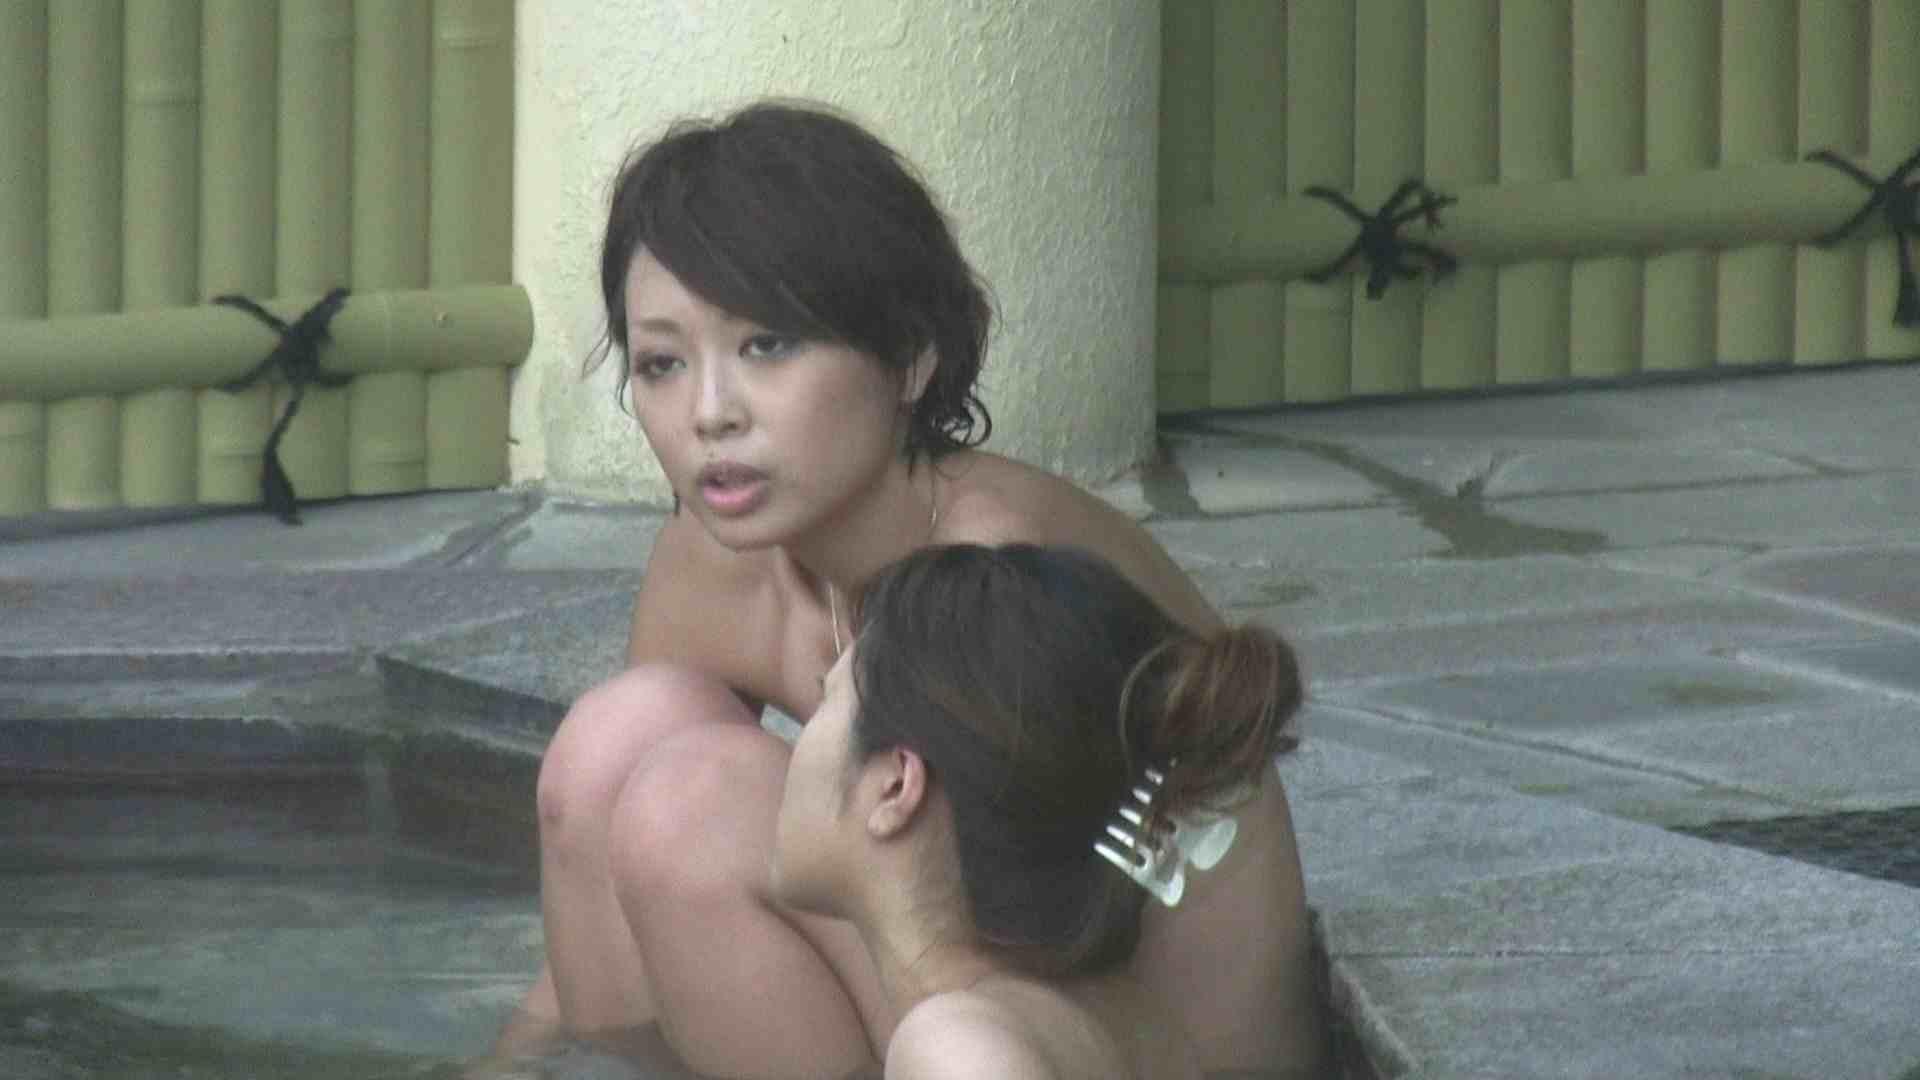 Aquaな露天風呂Vol.201 OLのエロ生活 | 露天風呂  96連発 88